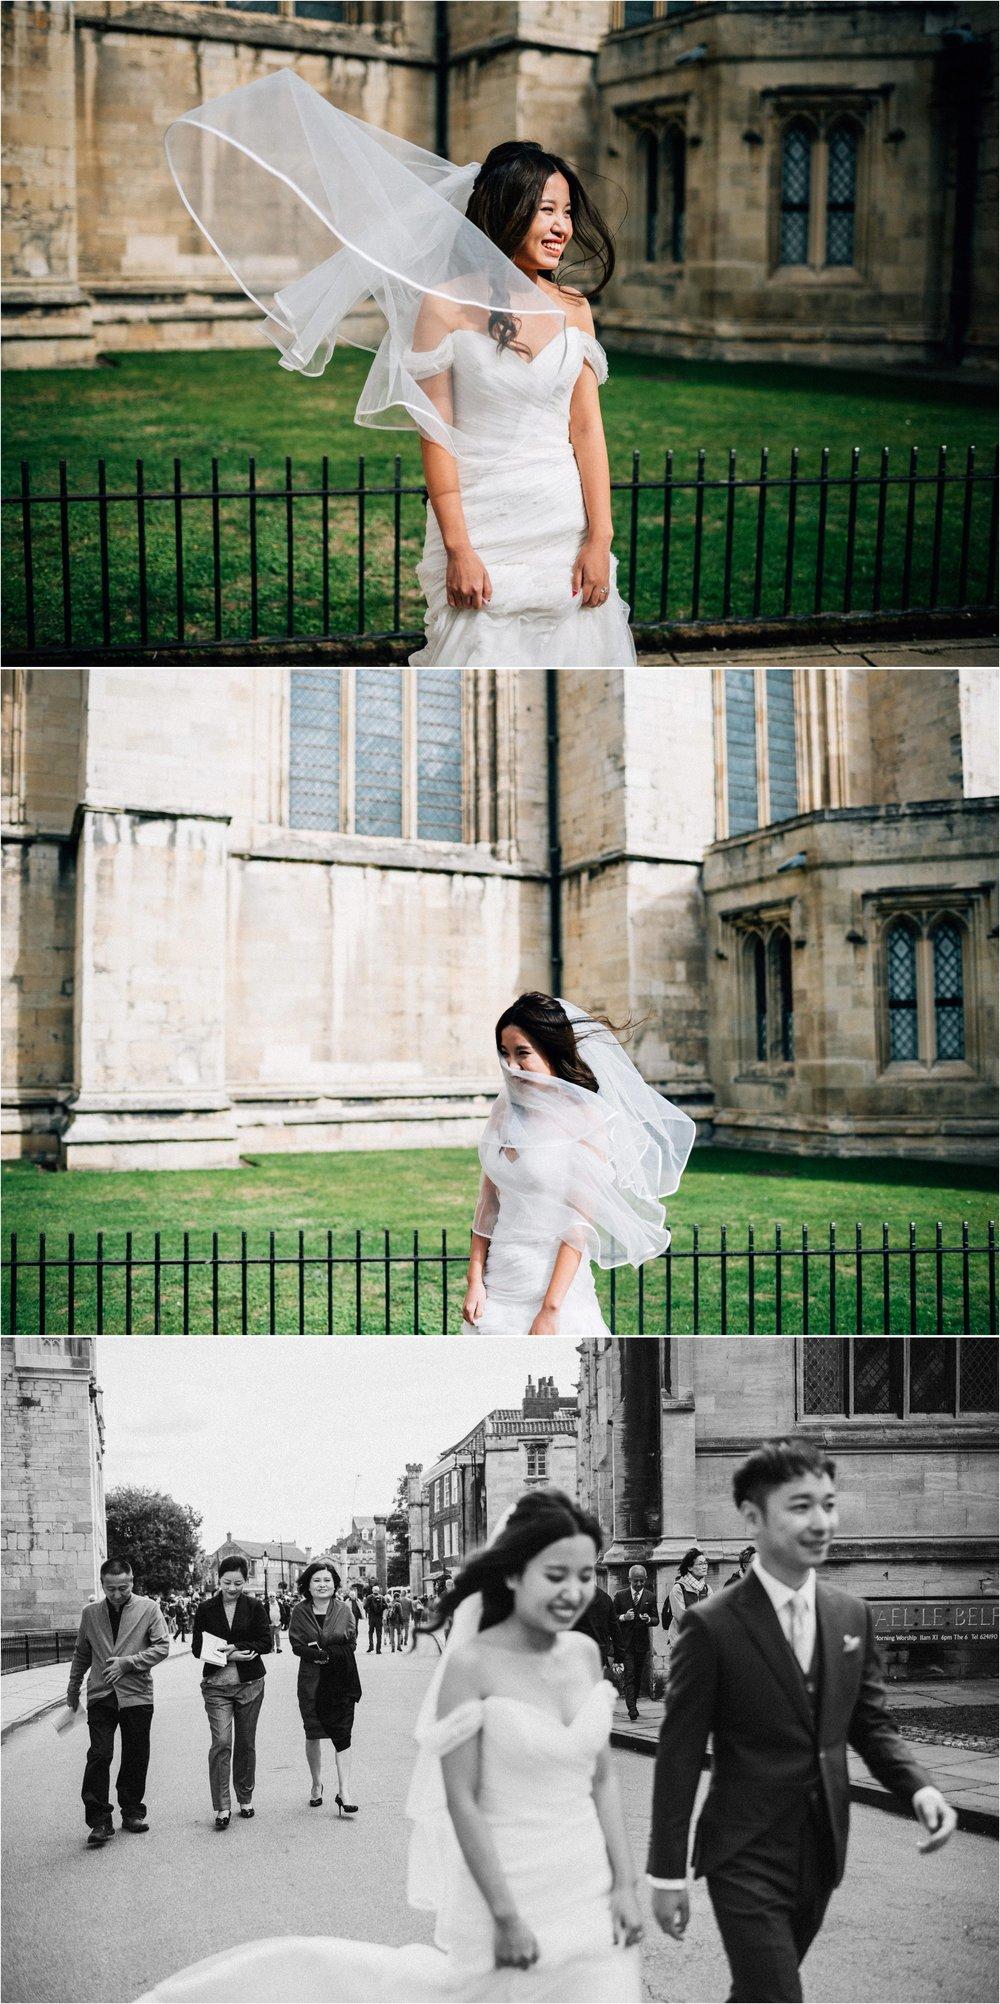 York city elopement wedding photographer_0149.jpg